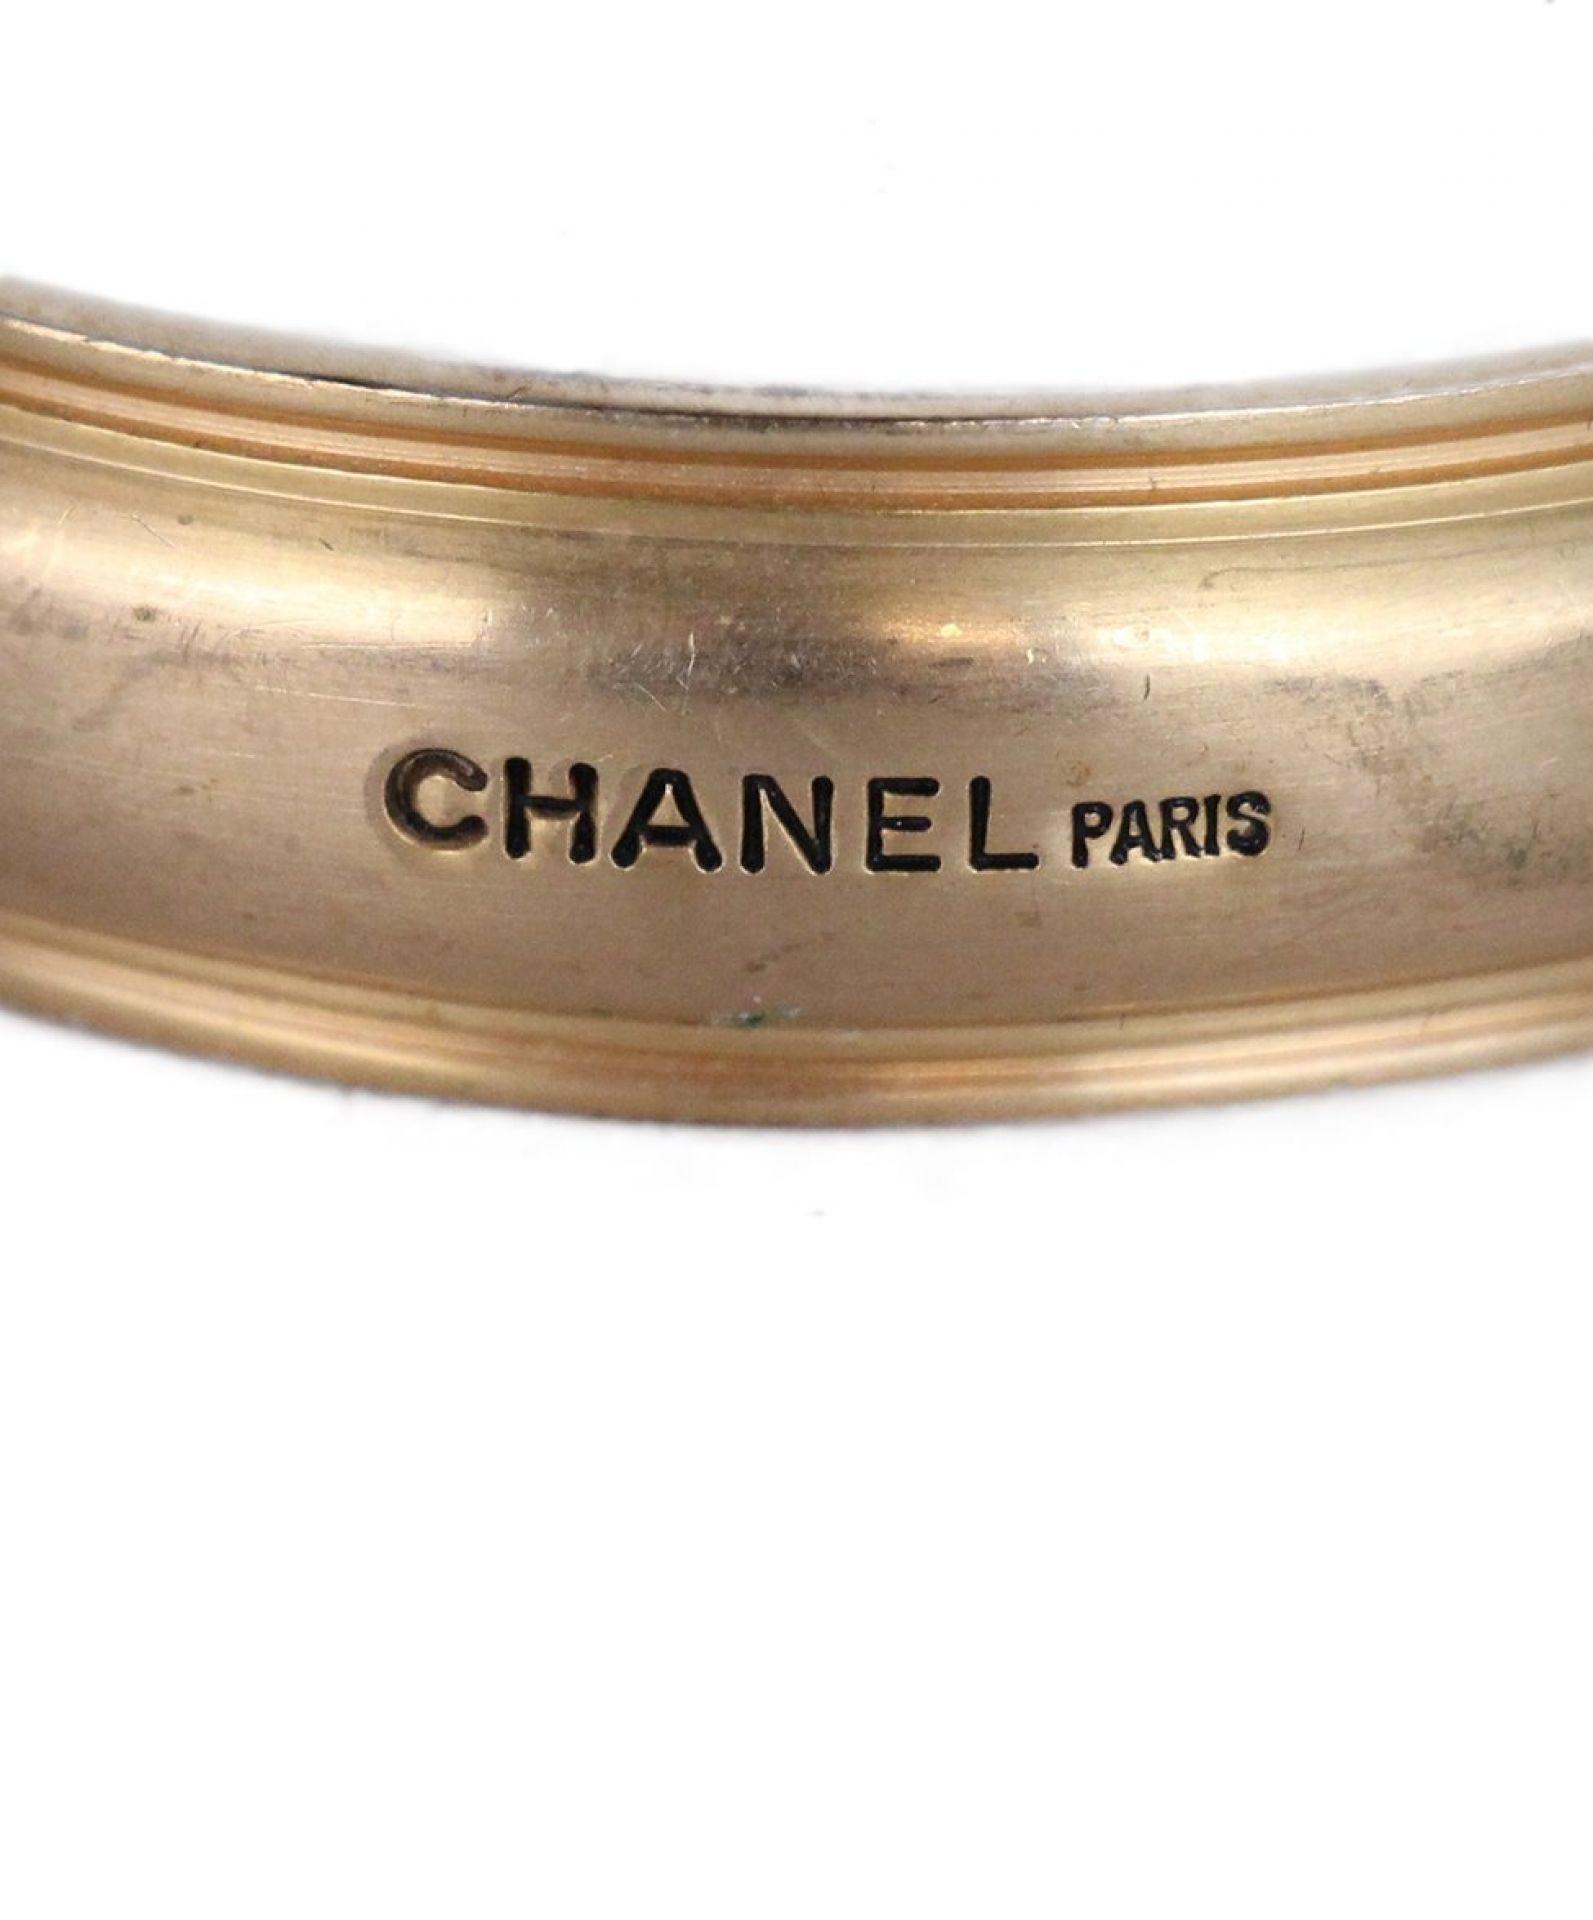 CHANEL BRONZE METAL BRACELET